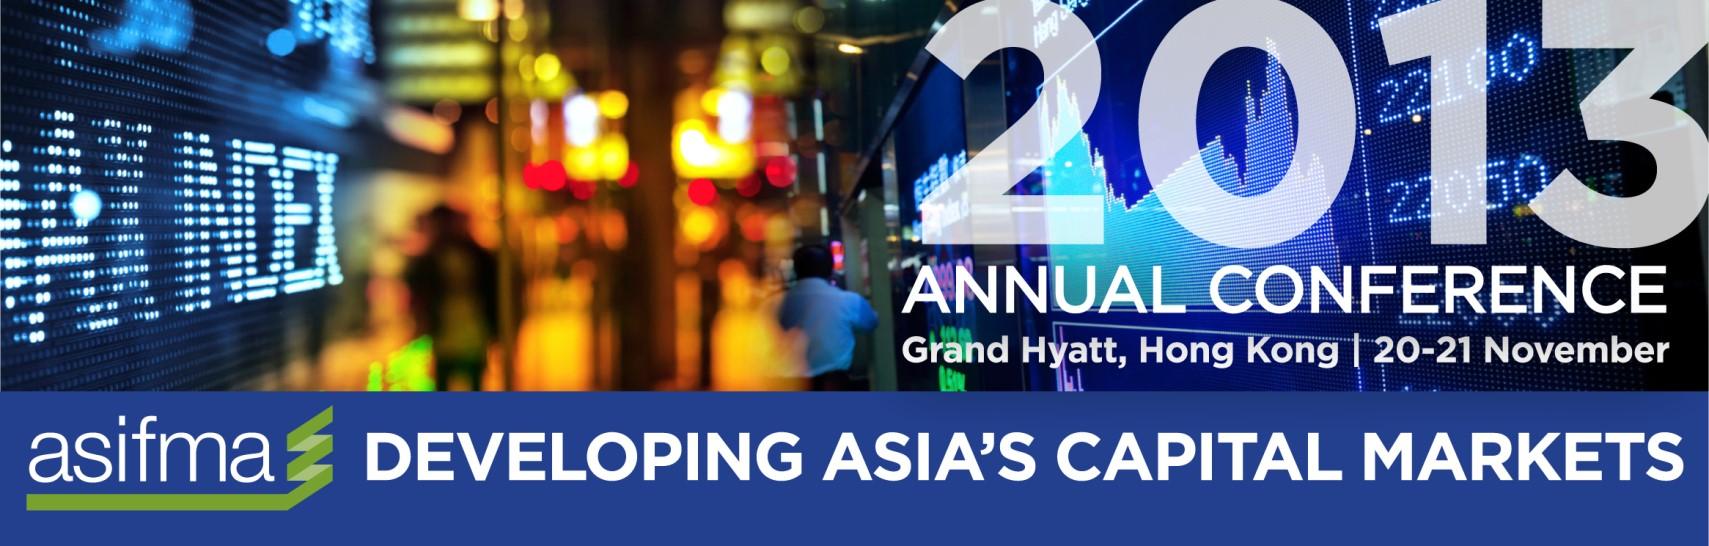 2013-ac-event-branding